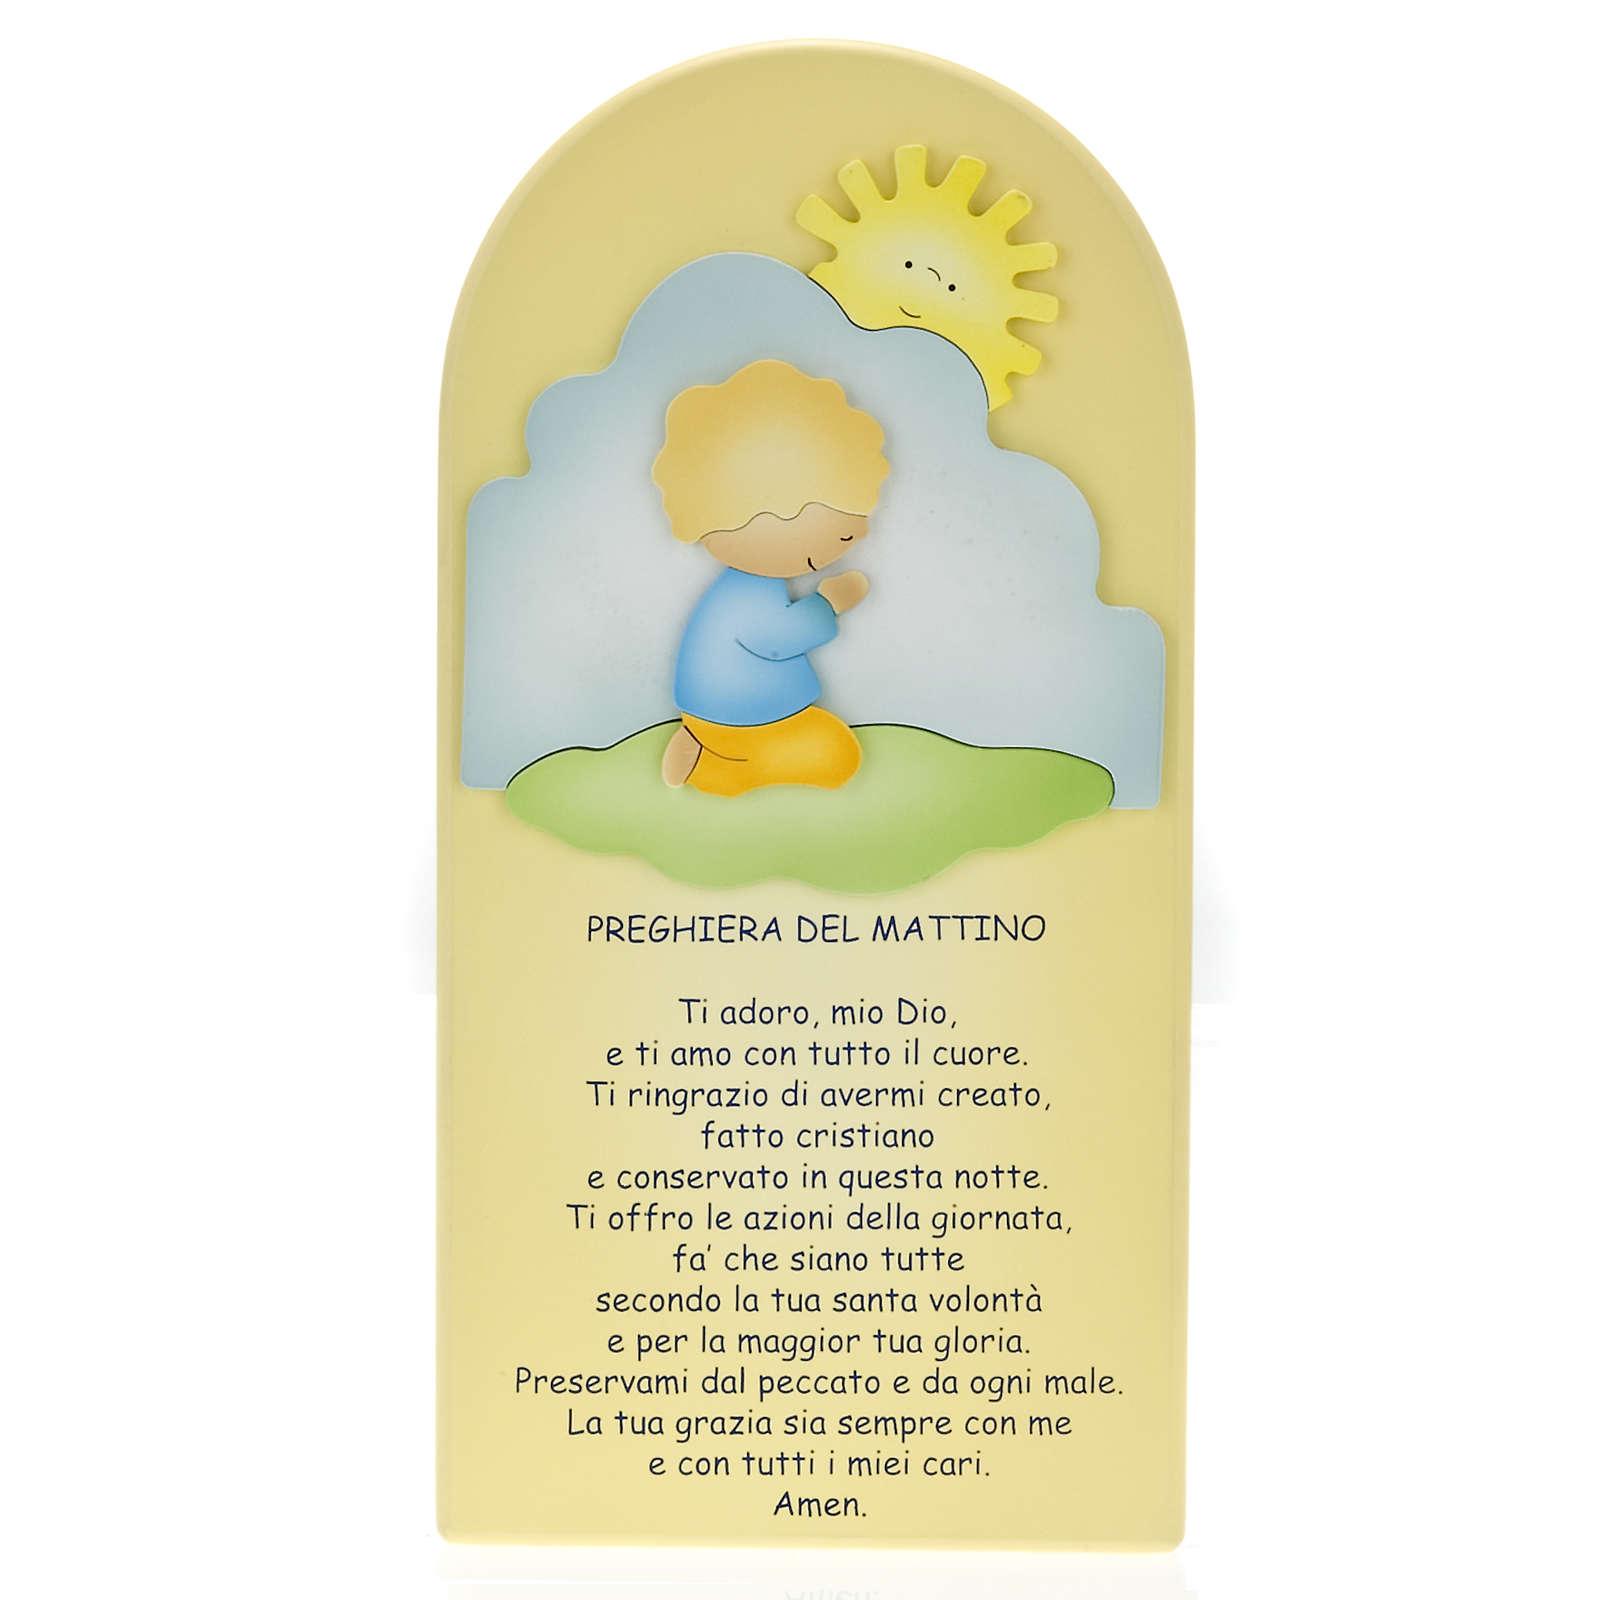 Bas-relief panel, Morning prayer 4